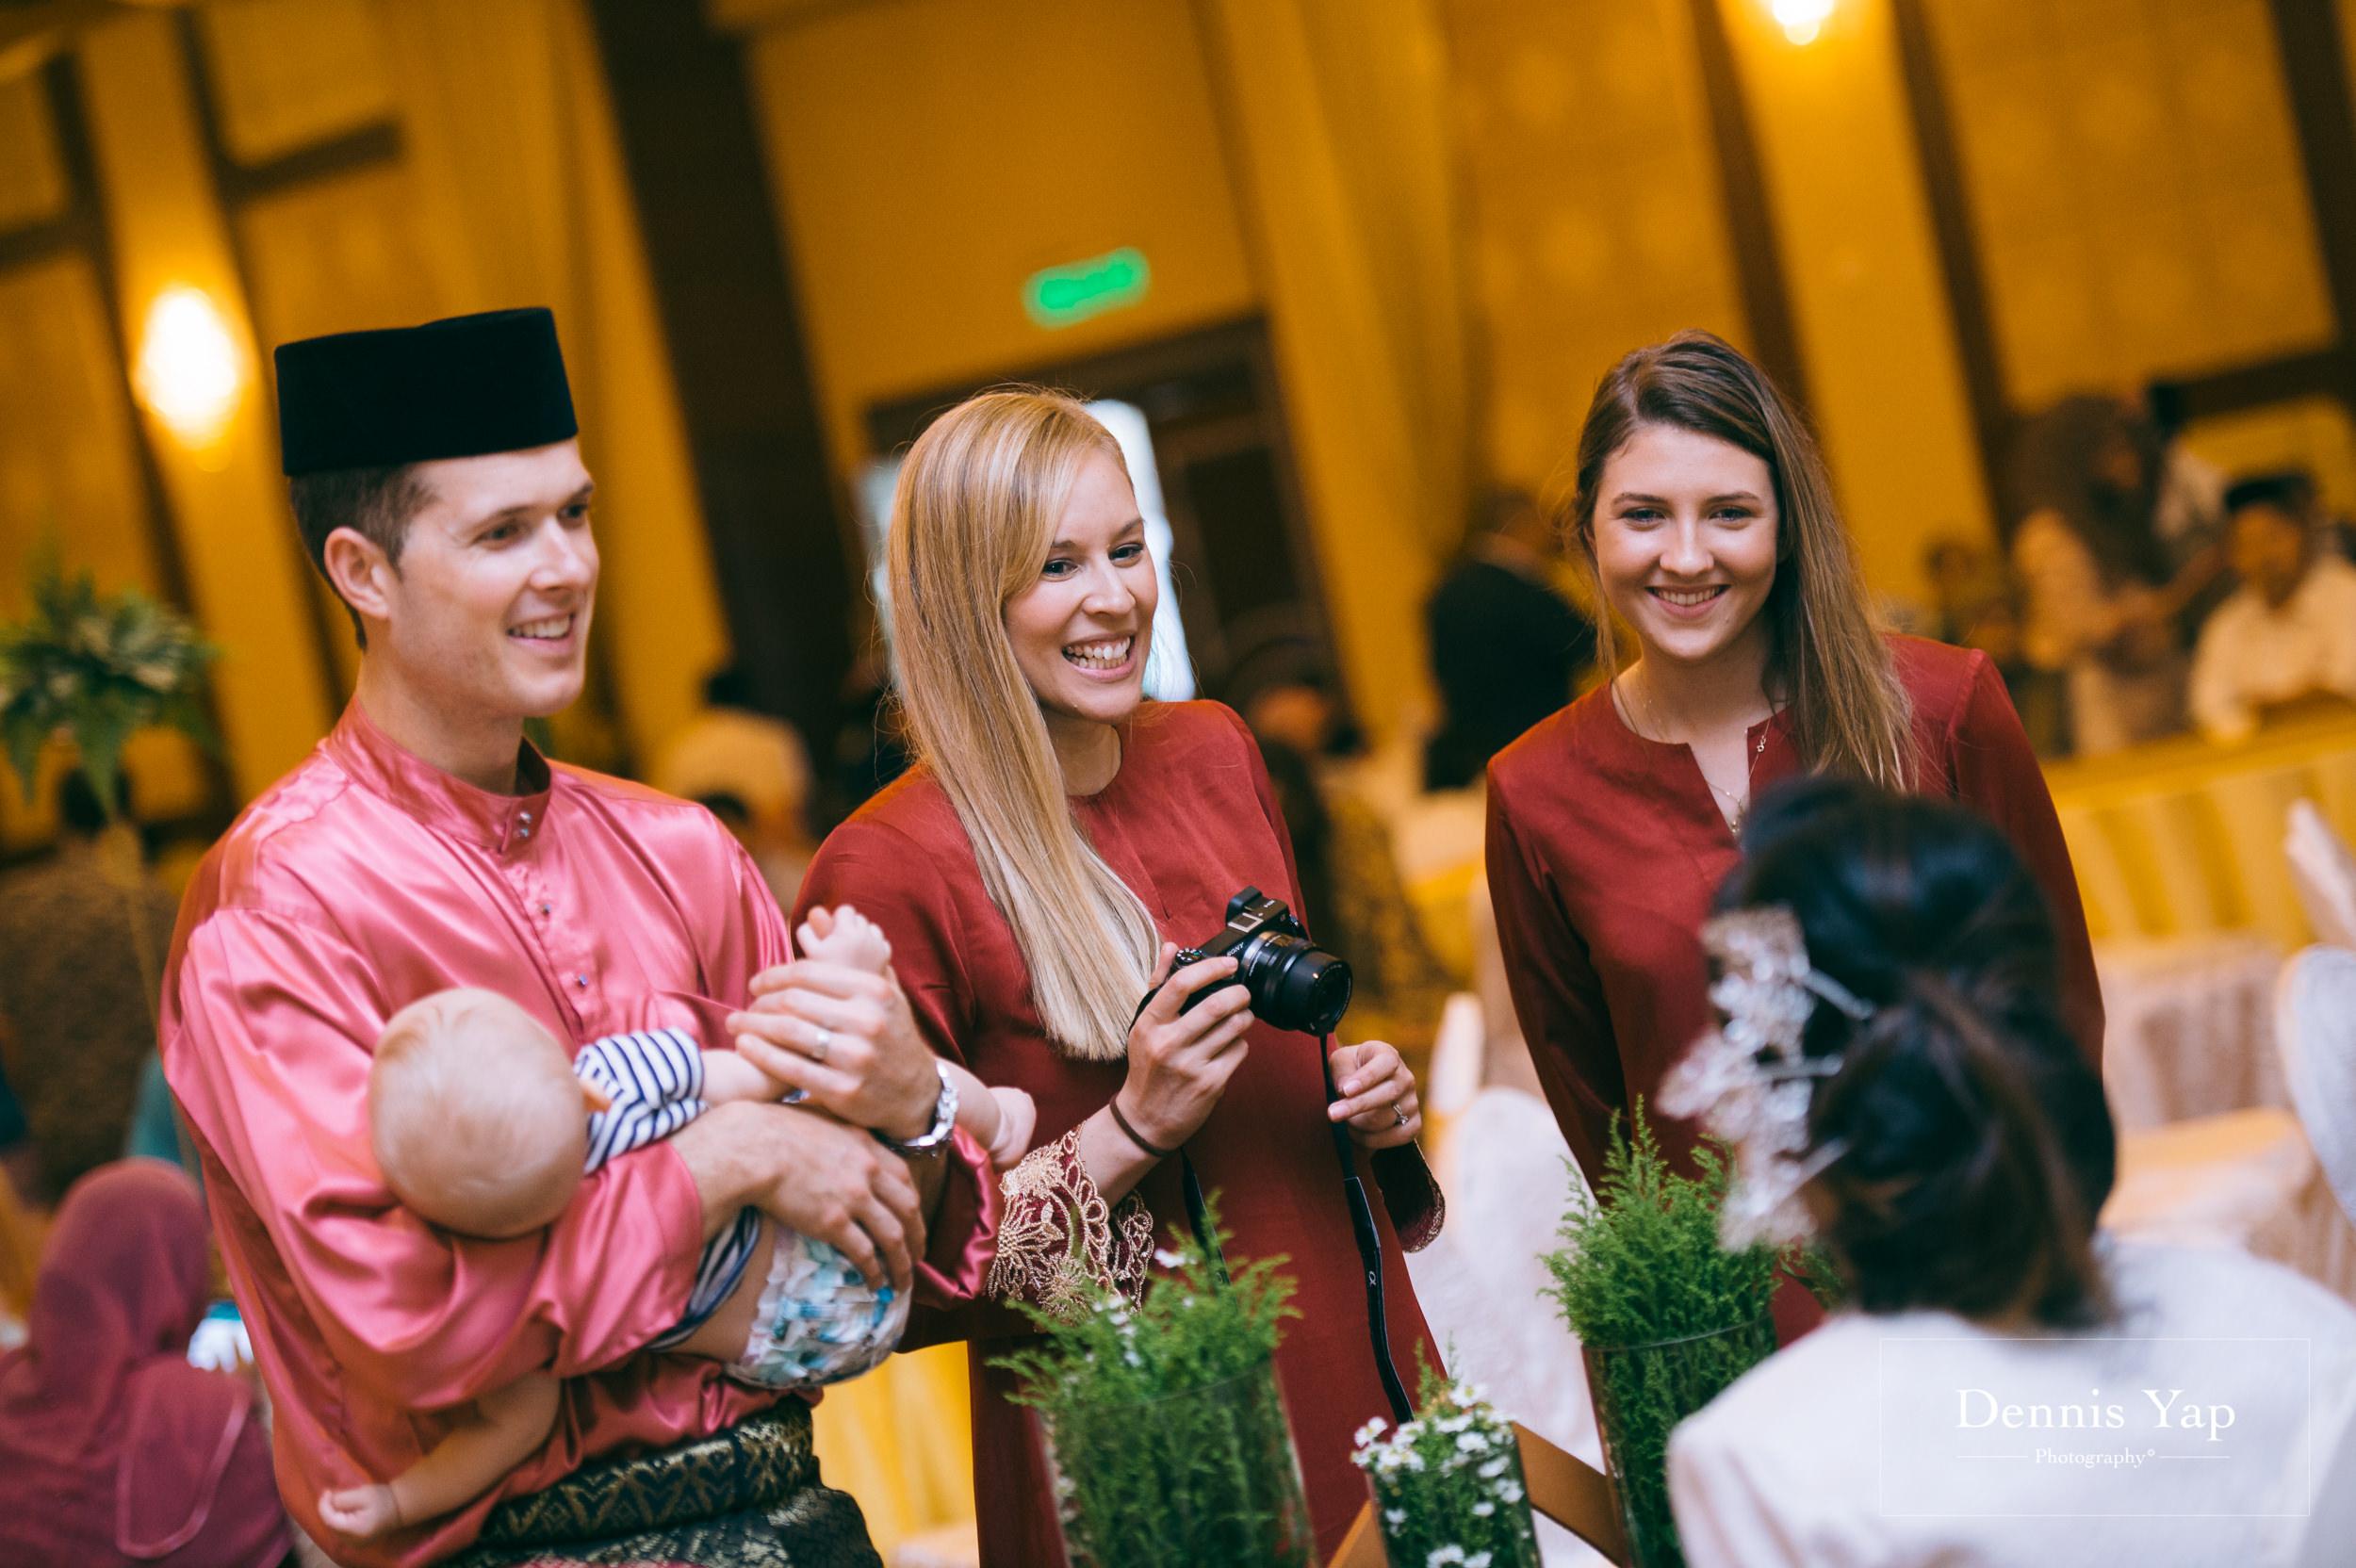 zarif hanalili malay wedding blessing ceremony dennis yap photography-21.jpg